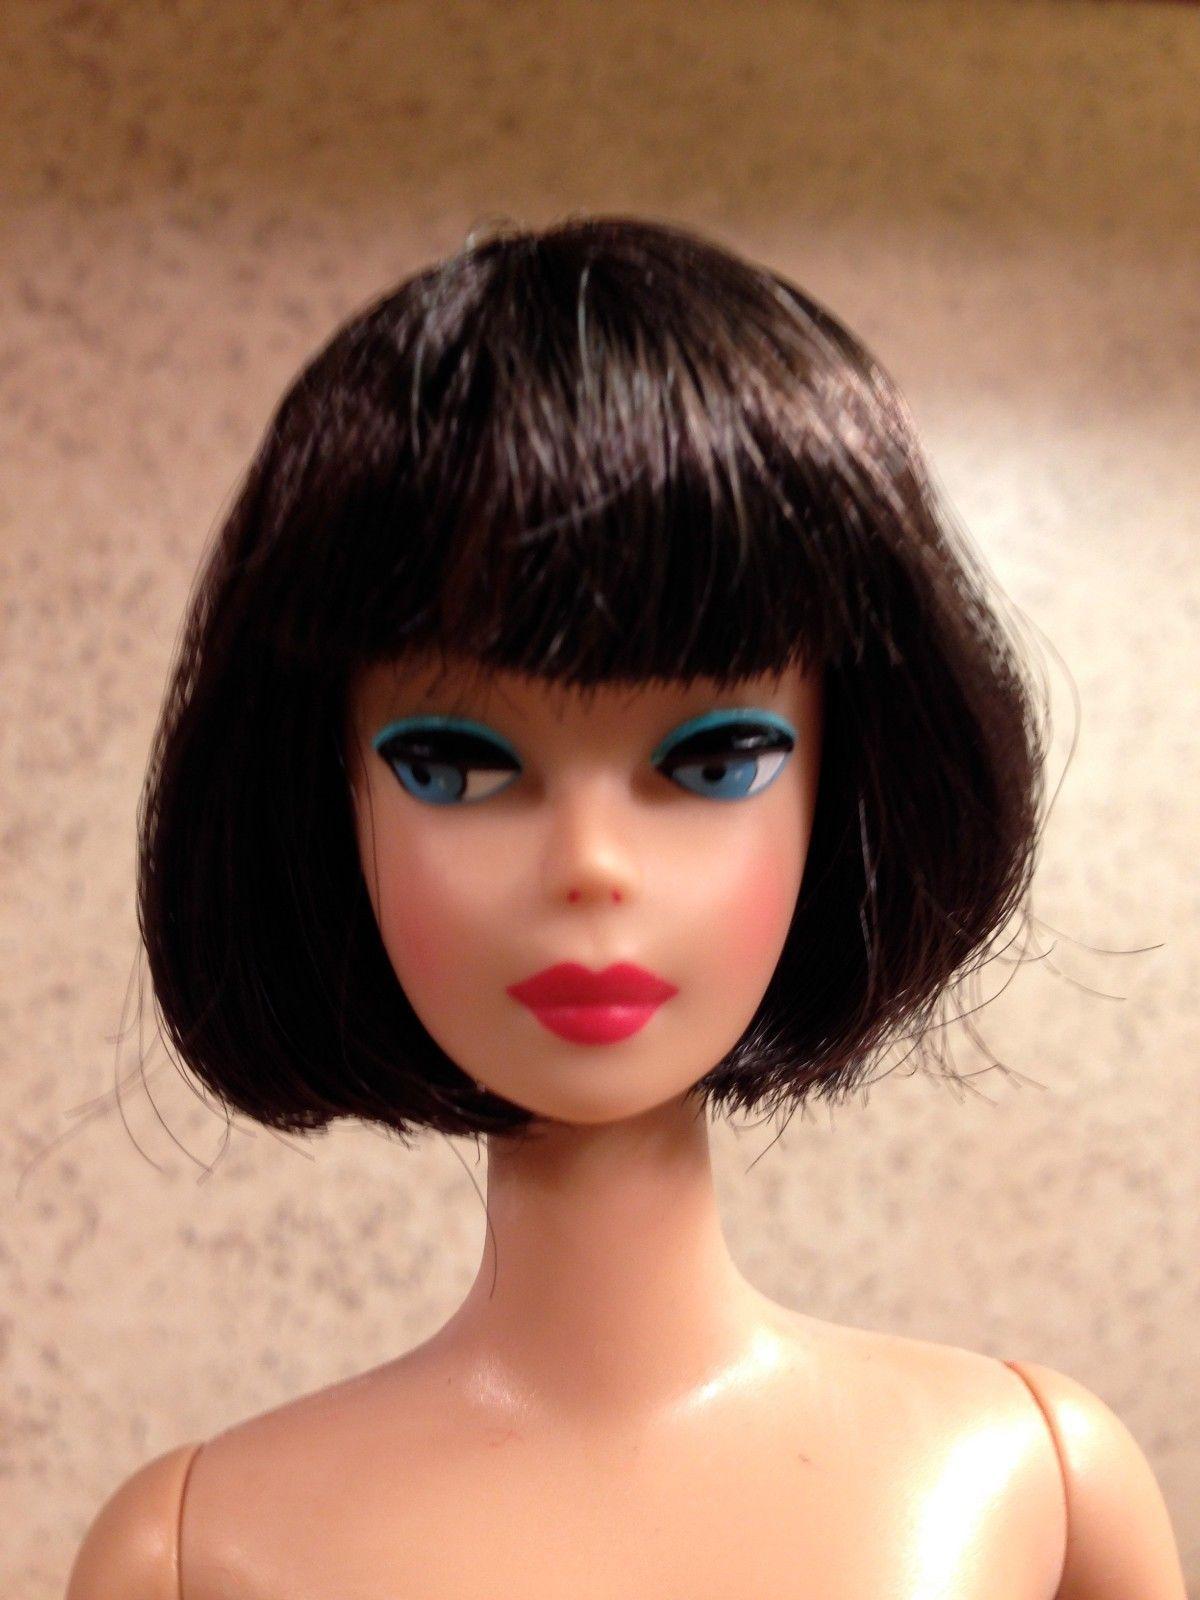 barbie-girl-japanese-version-redhead-charli